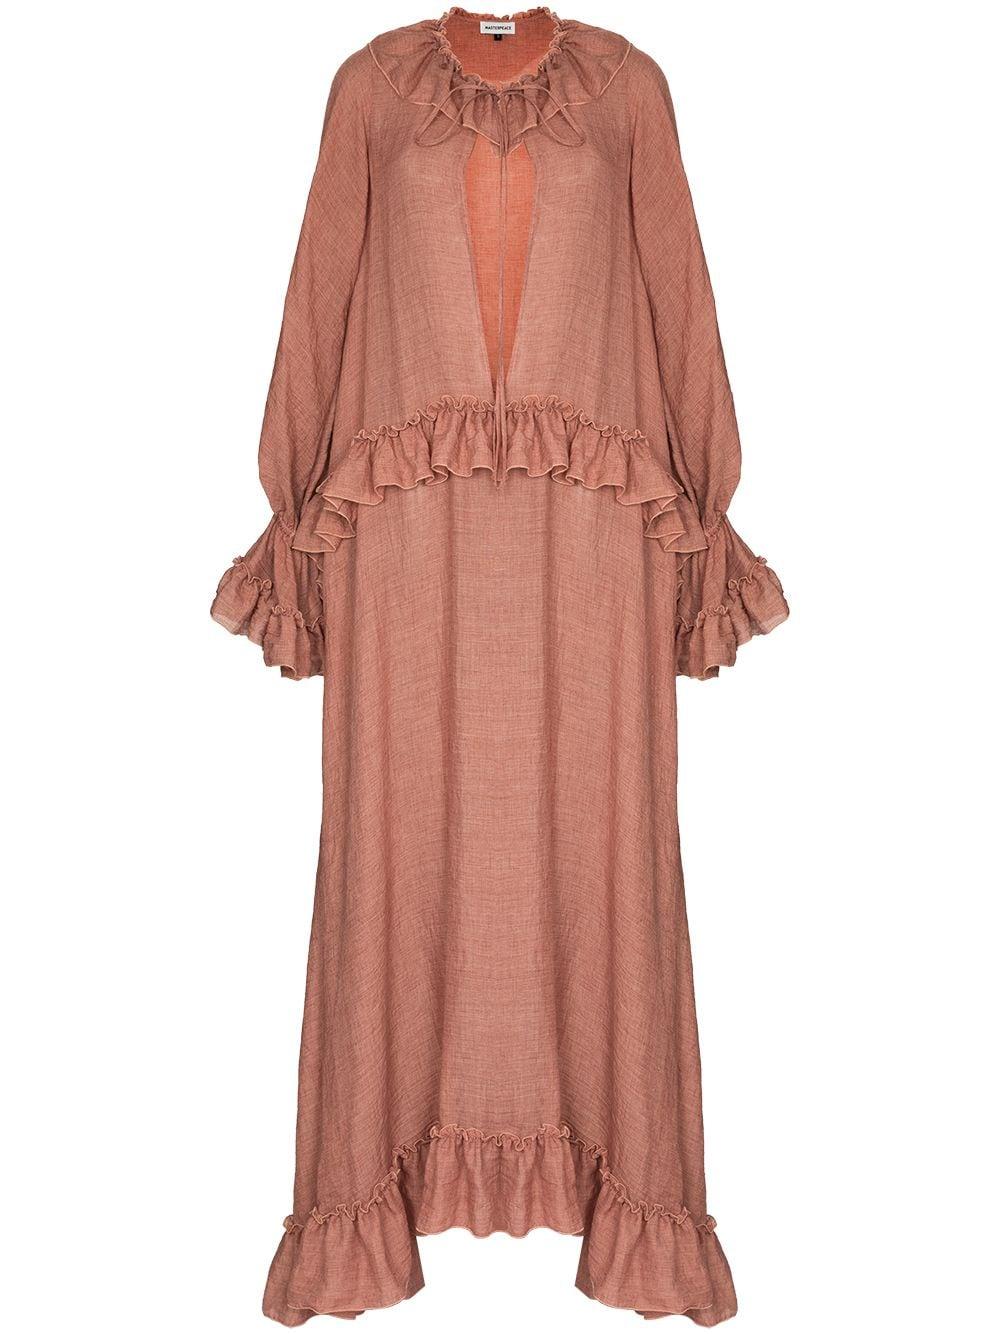 Masterpeace Ruffled Cotton Maxi Dress Farfetch Maxi Dress Cotton Dresses Maxi Dress [ 1334 x 1000 Pixel ]